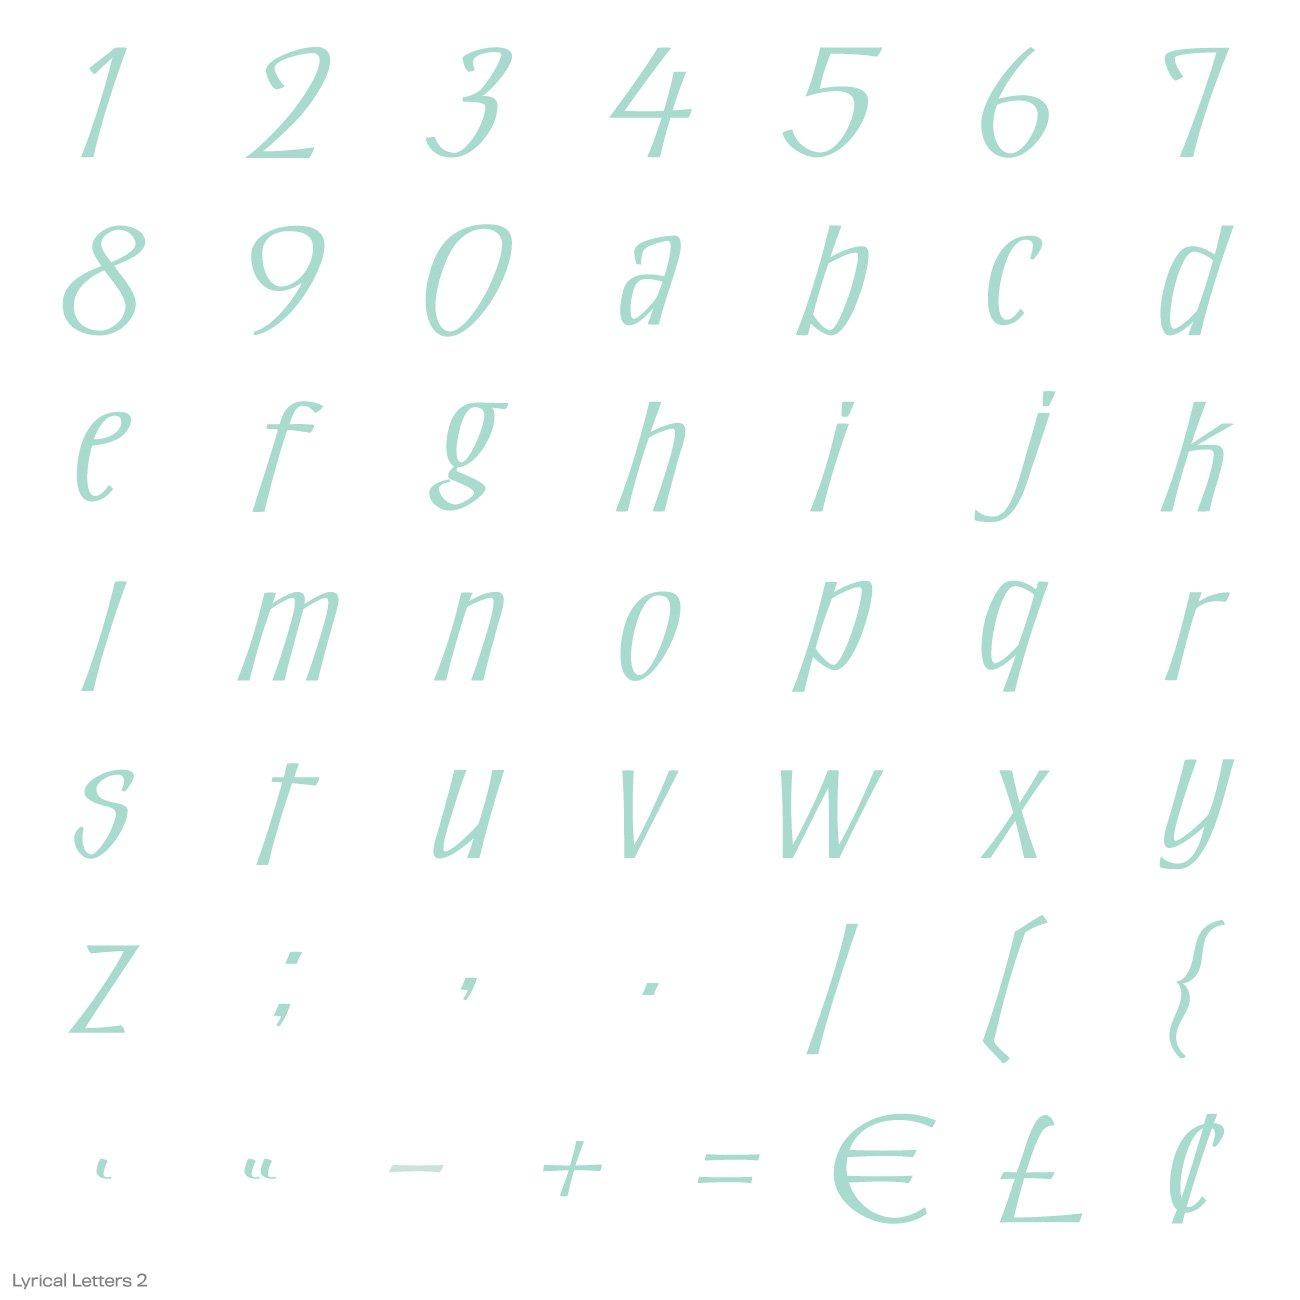 Cricut Lyrical Letters 2 Cartridge by Cricut (Image #20)